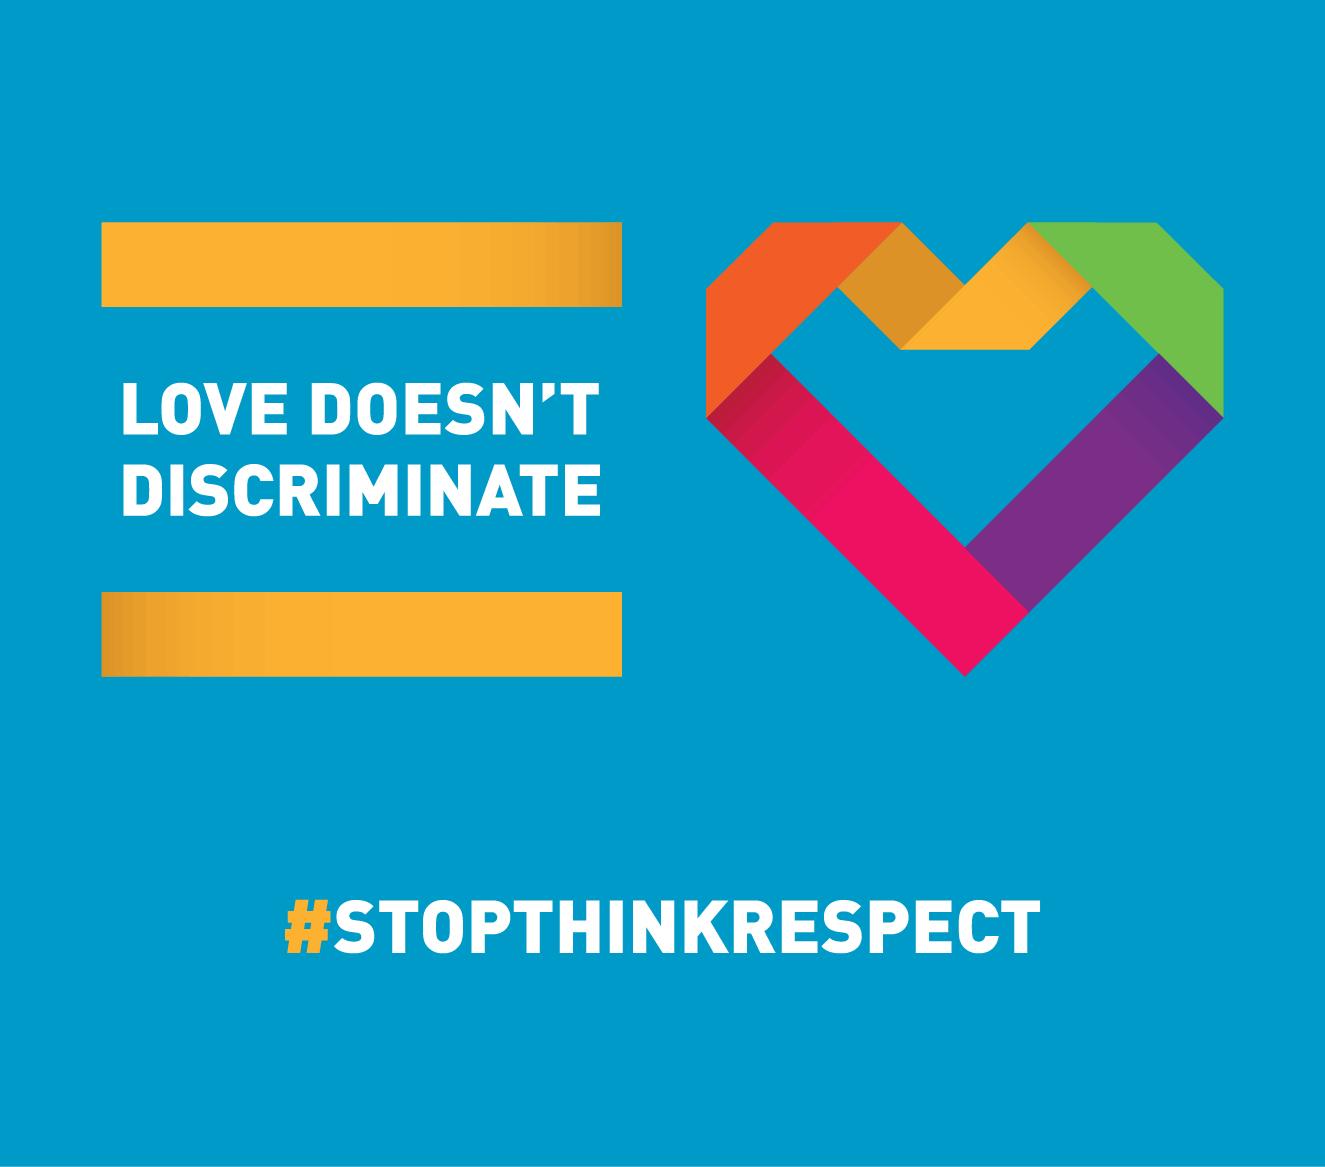 Love doesn't discriminate